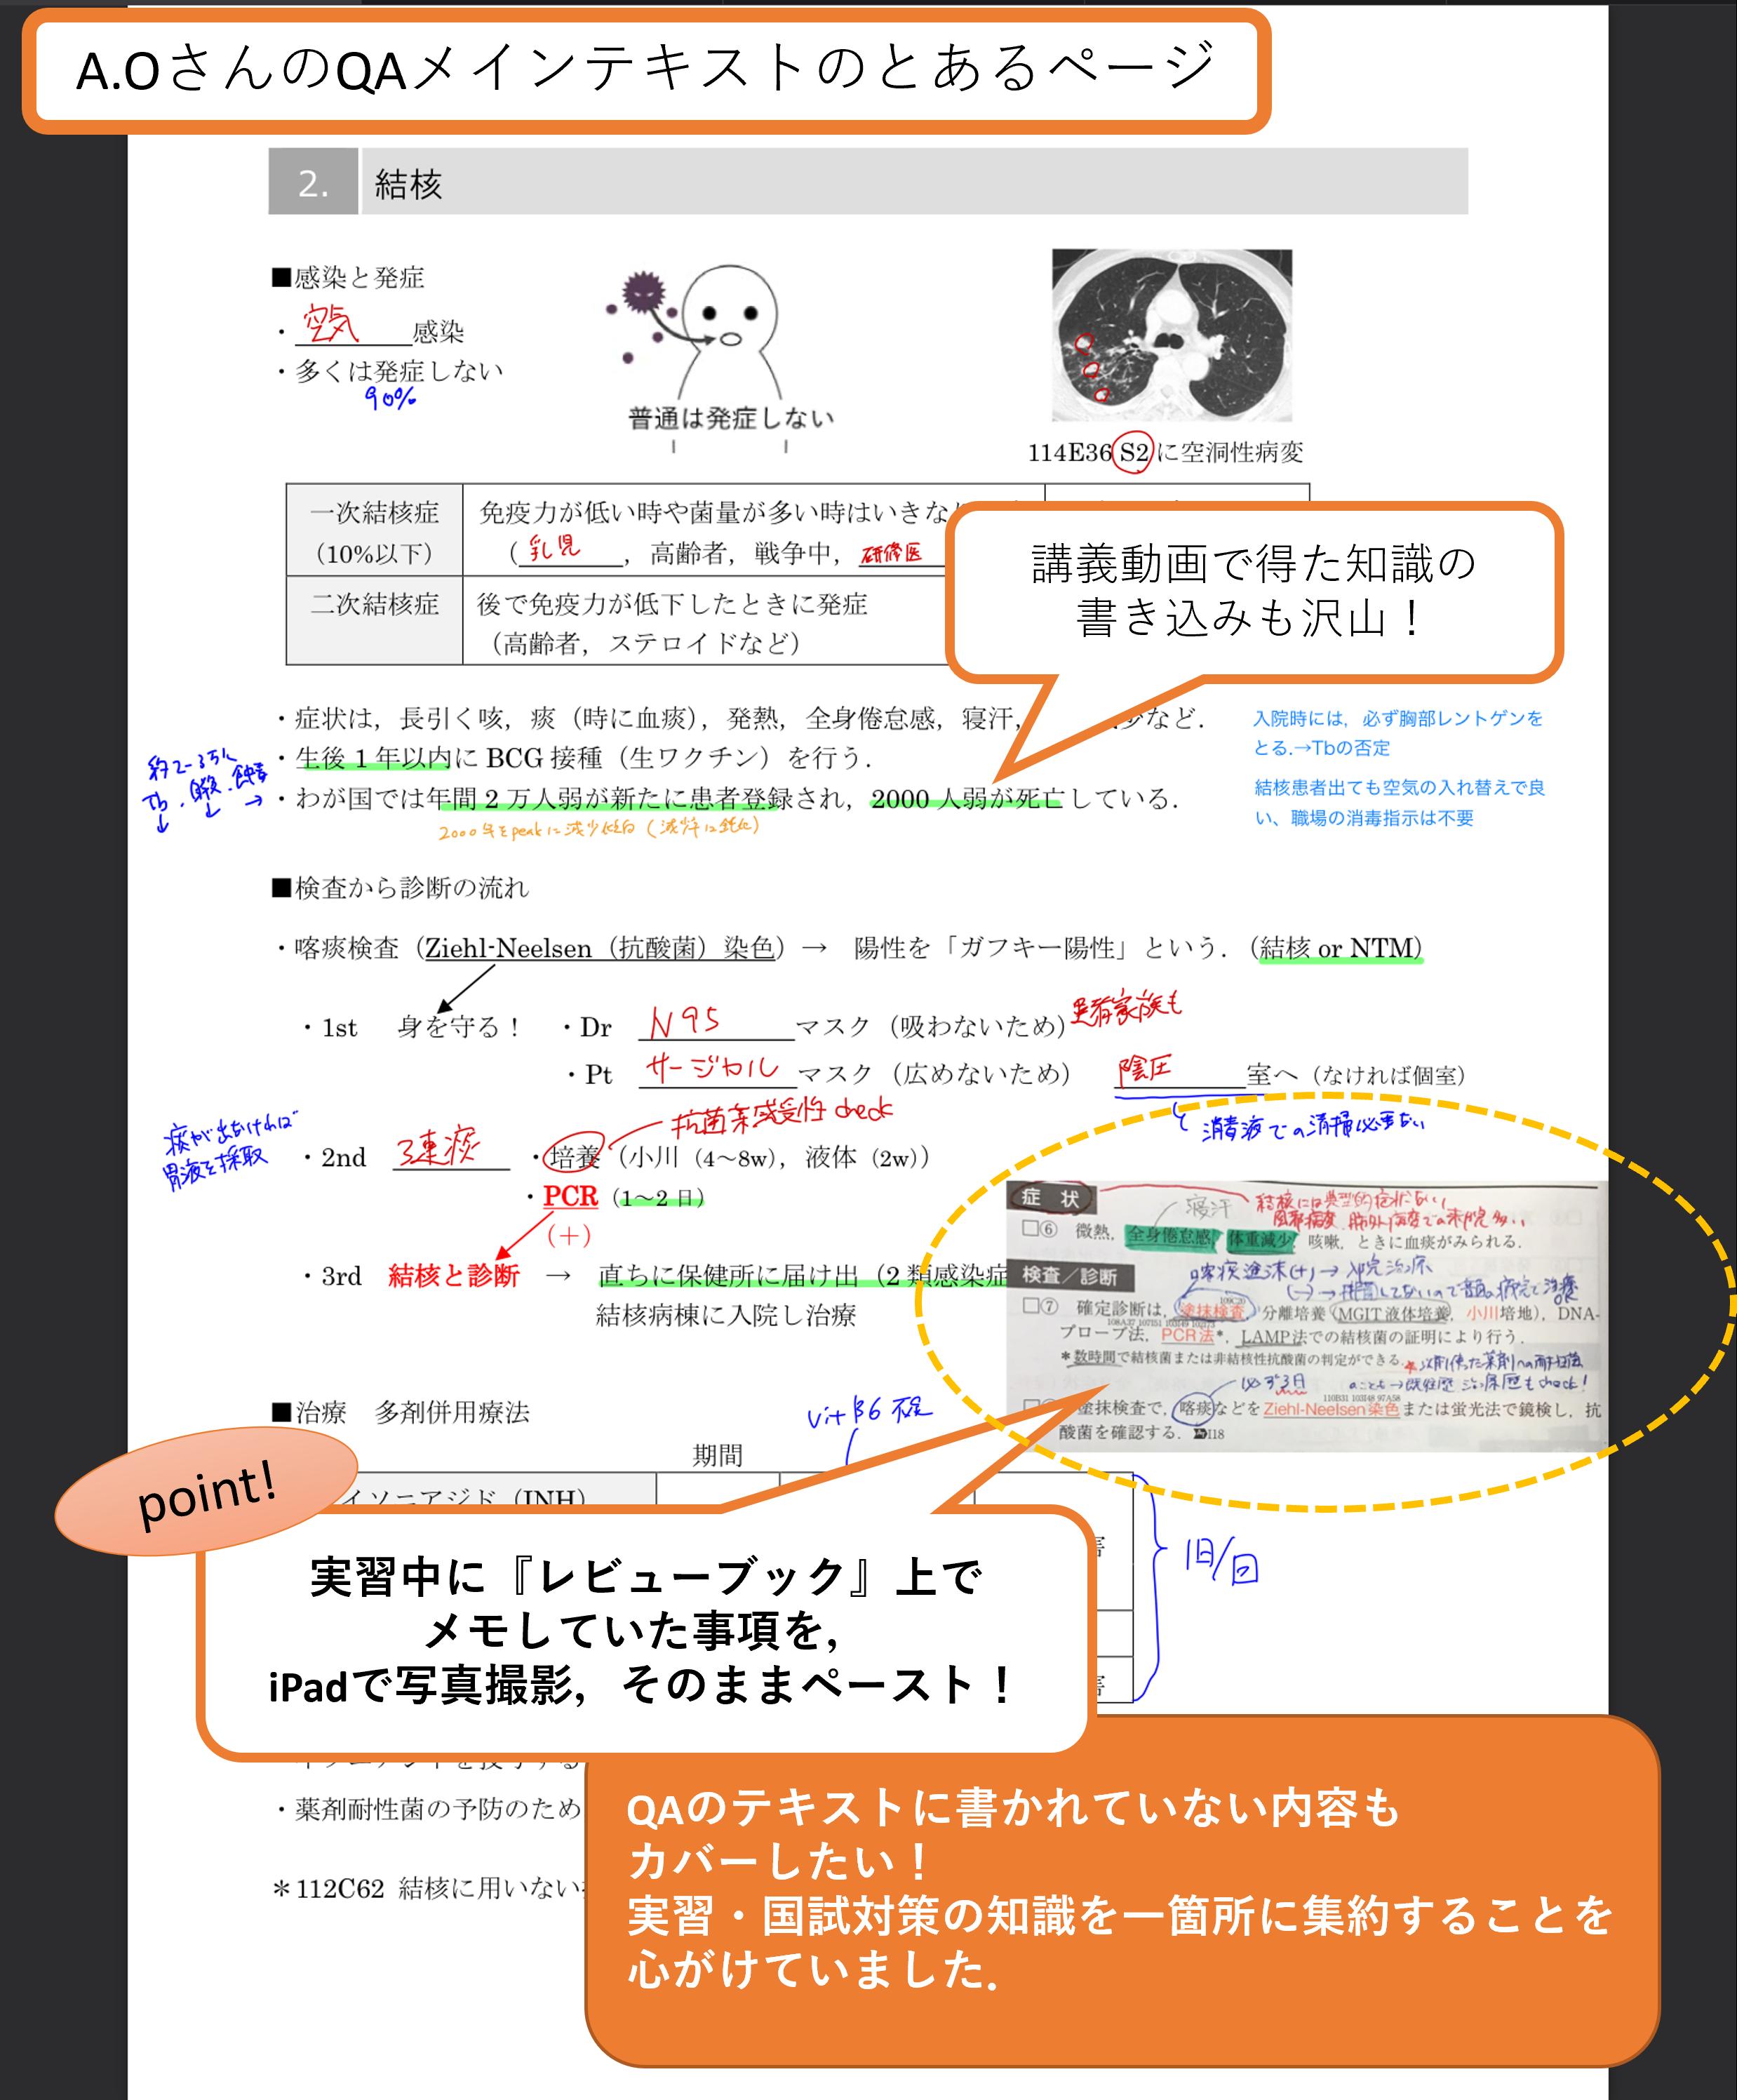 QA「結核」のページにレビューブック内科・外科紙面上のメモを貼り付けた例